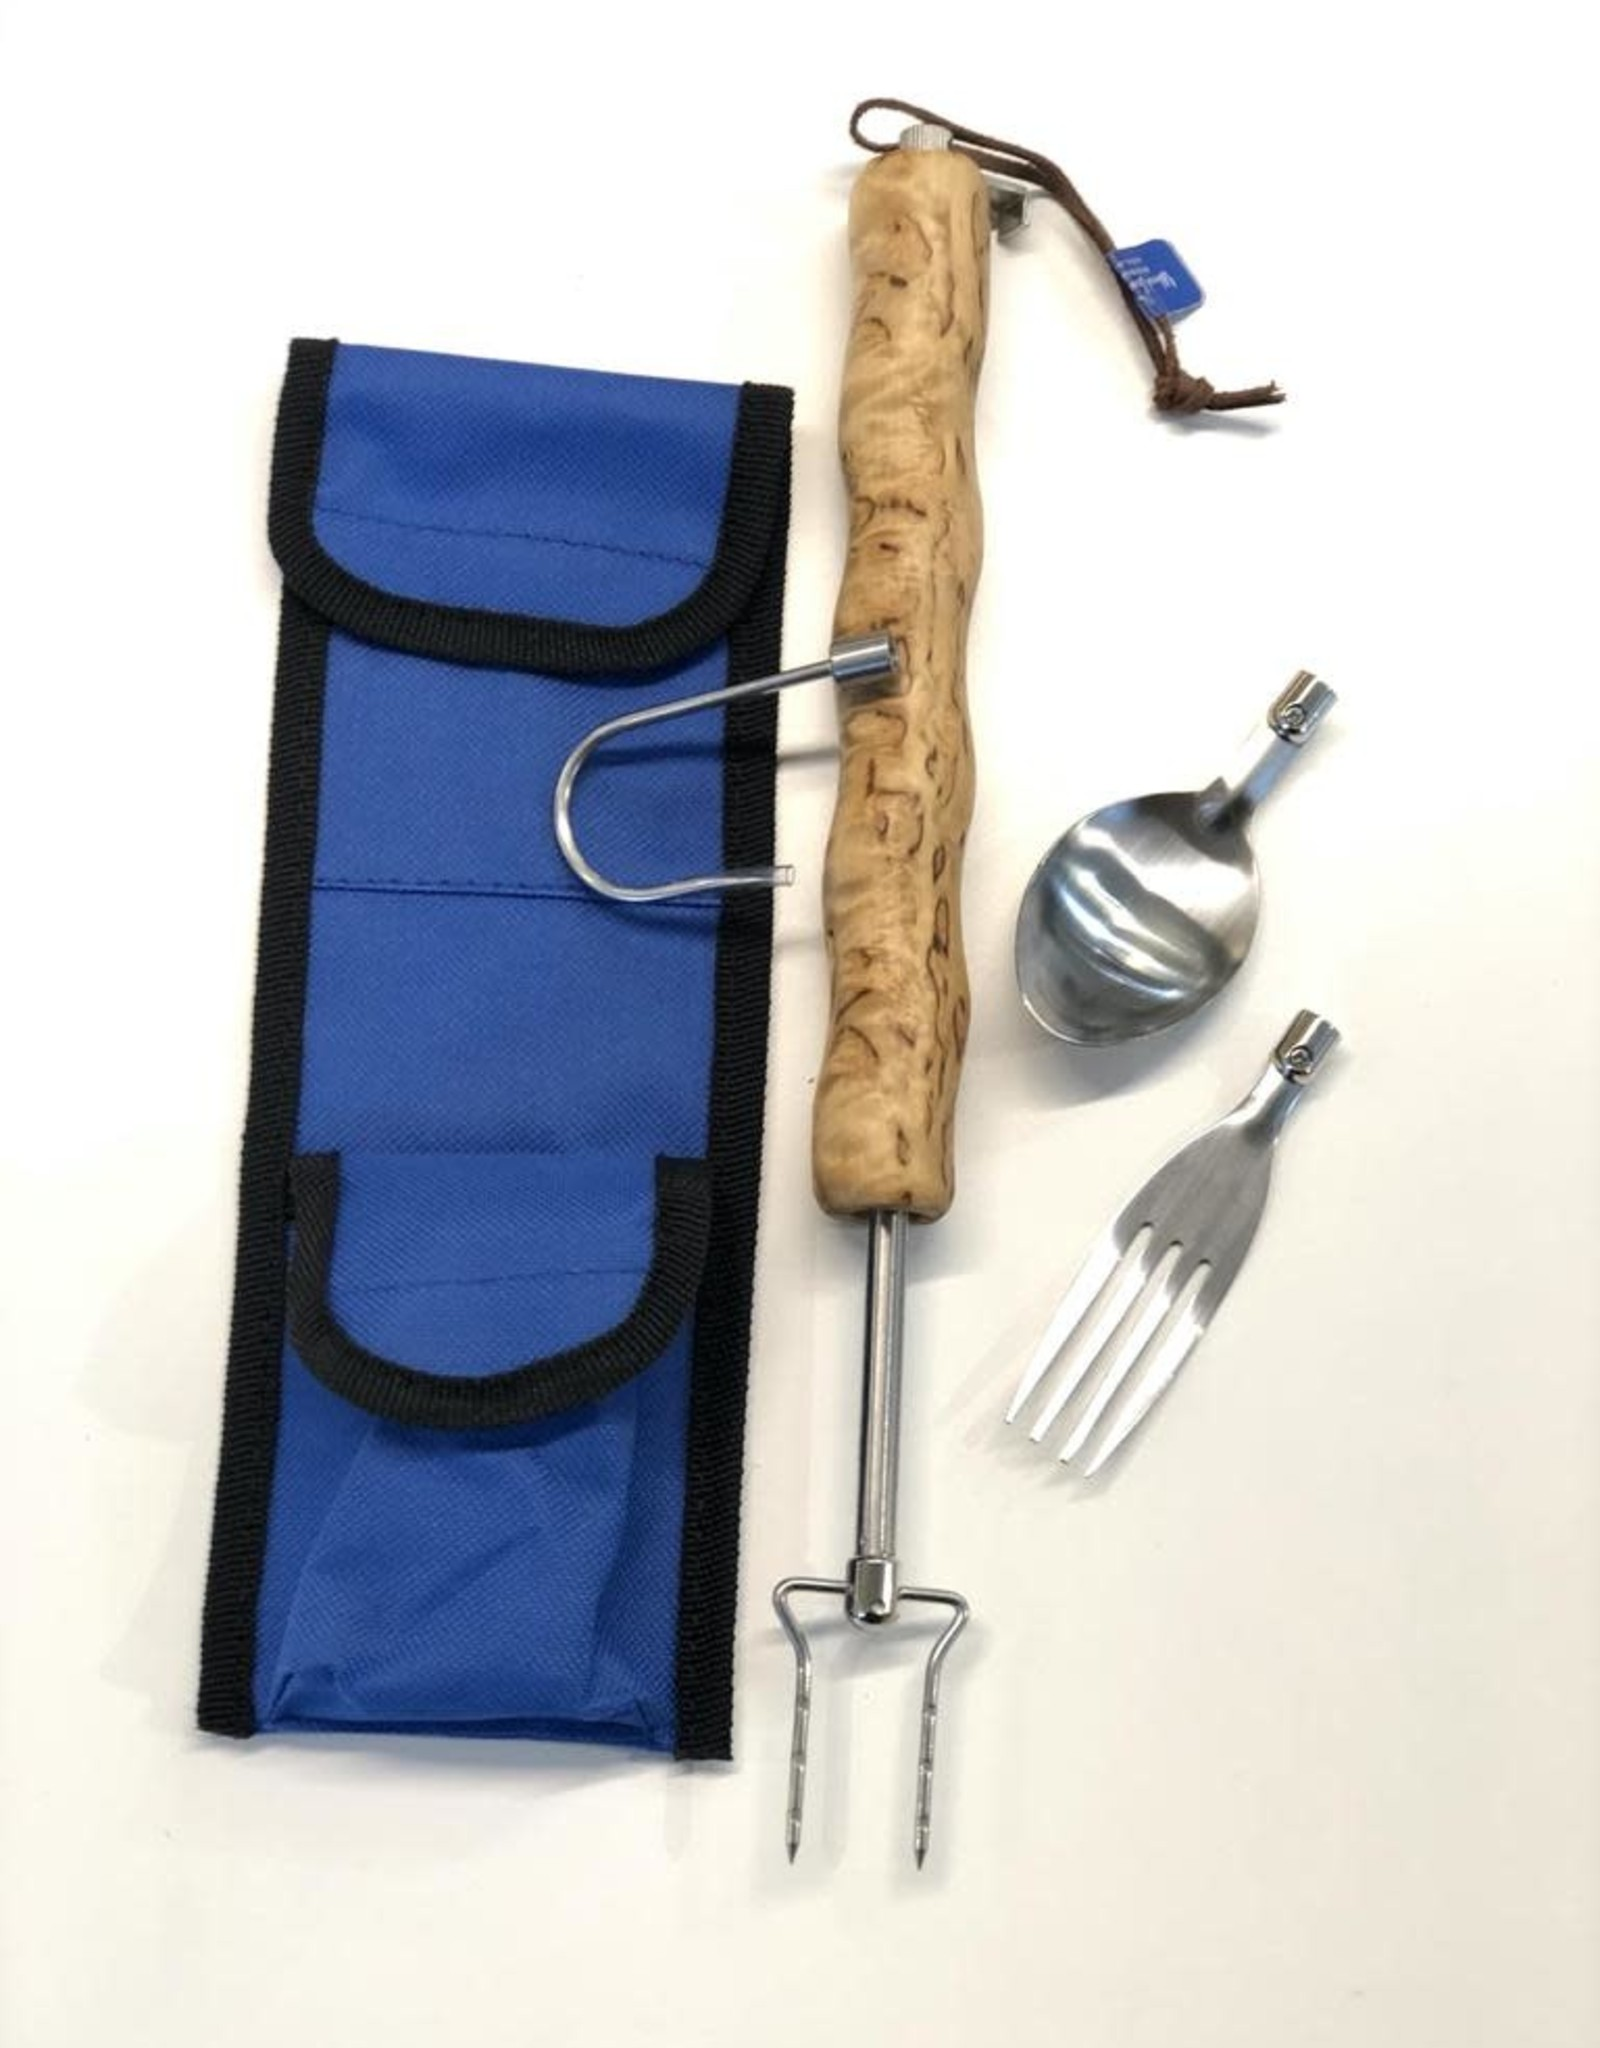 Puukko Knives Puukko Knives Barbeque Set